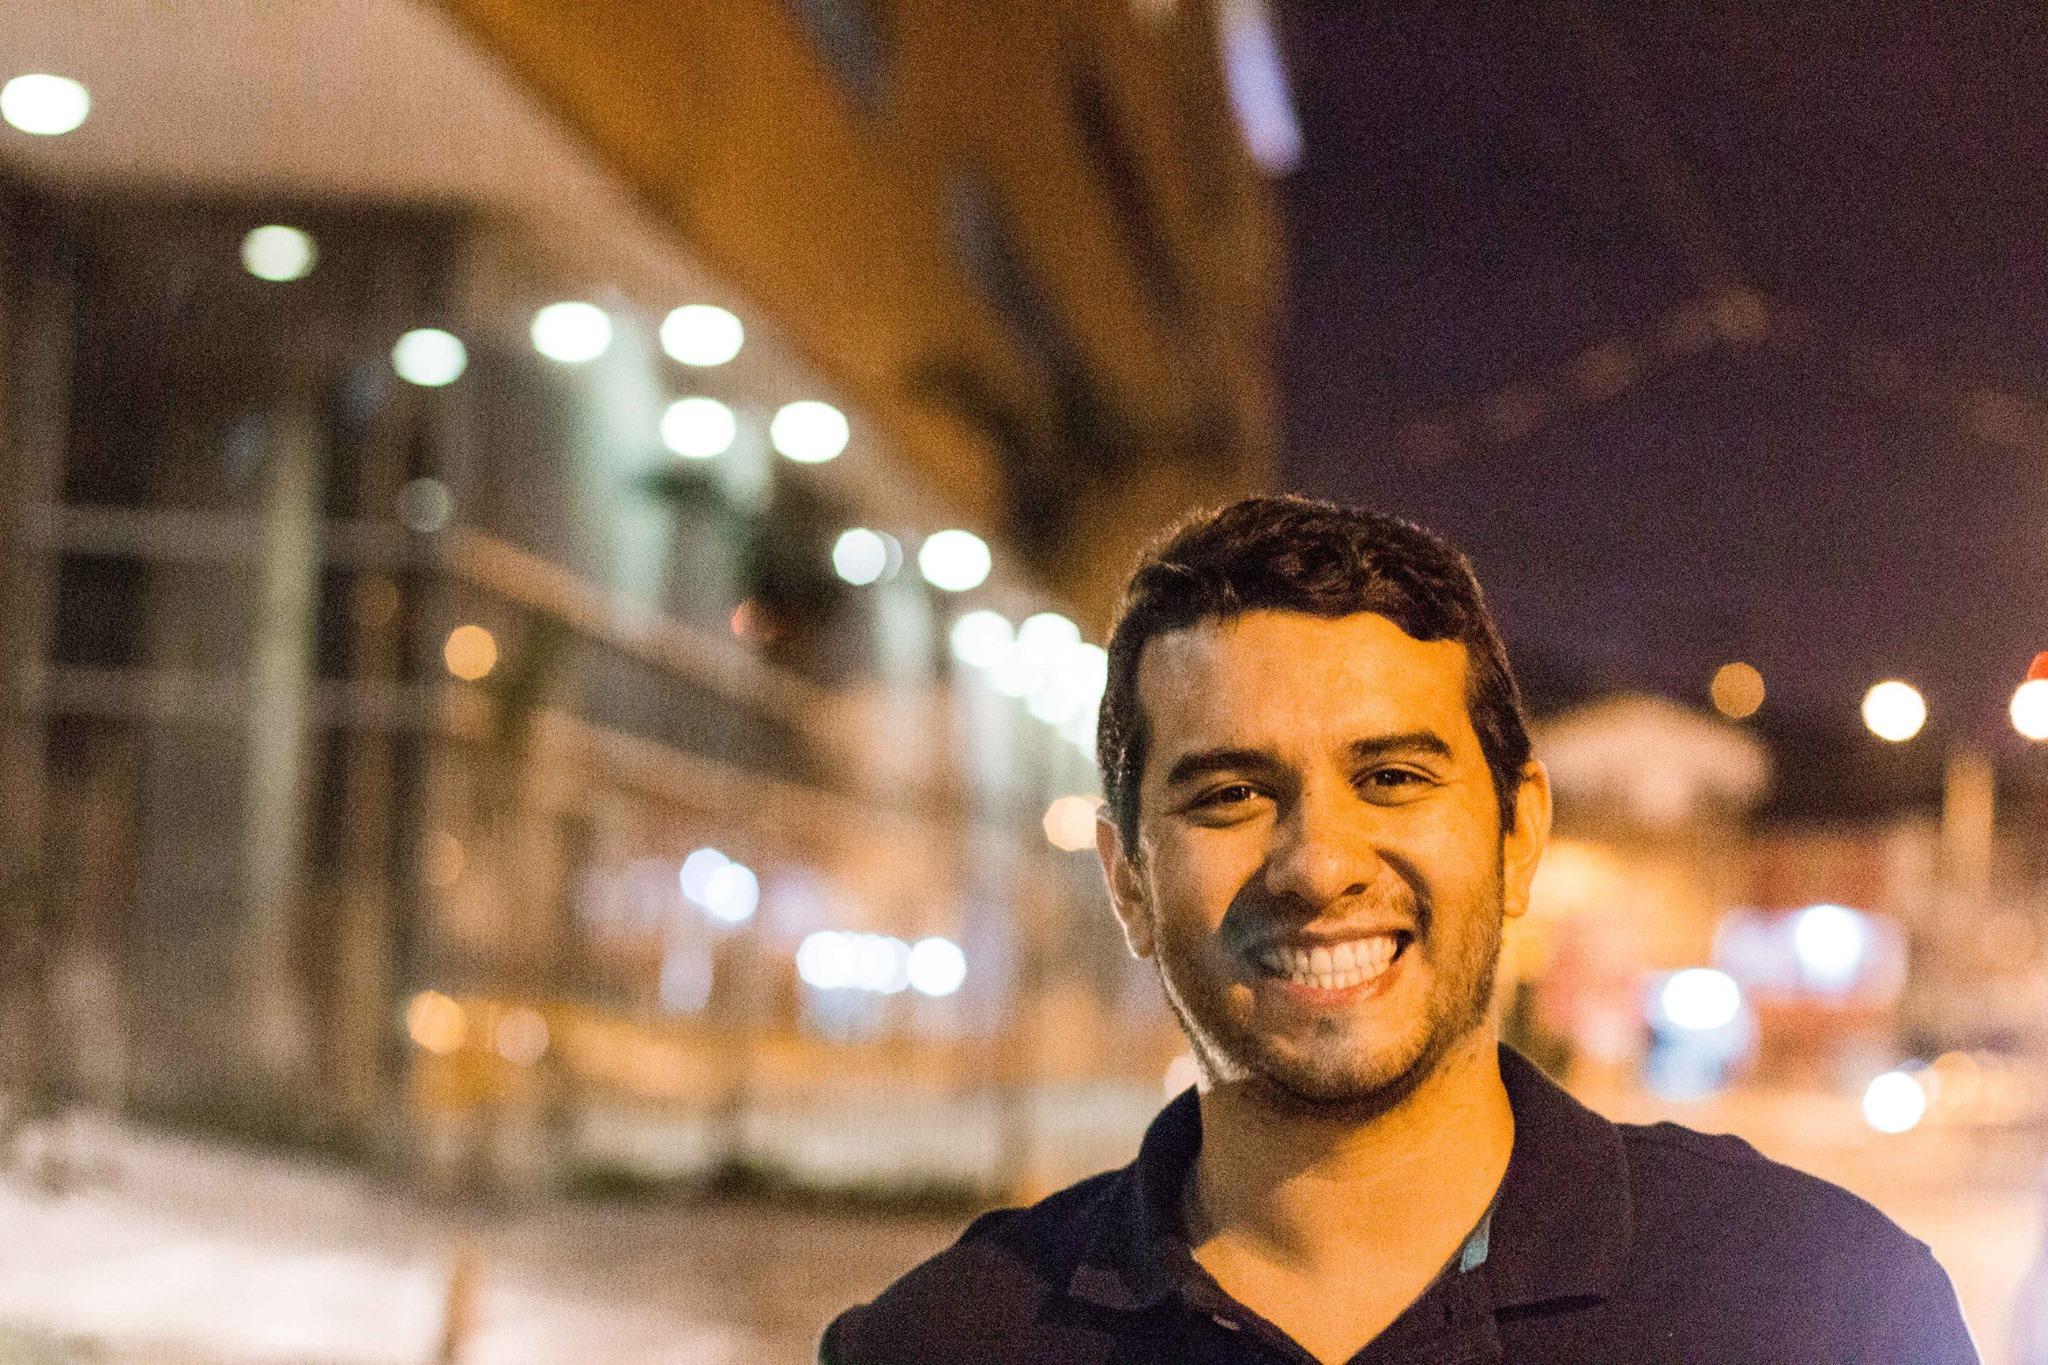 Episode 017 - Global Shapers SeriesEsteban Jaramillo, Medellin, Colombia Hub